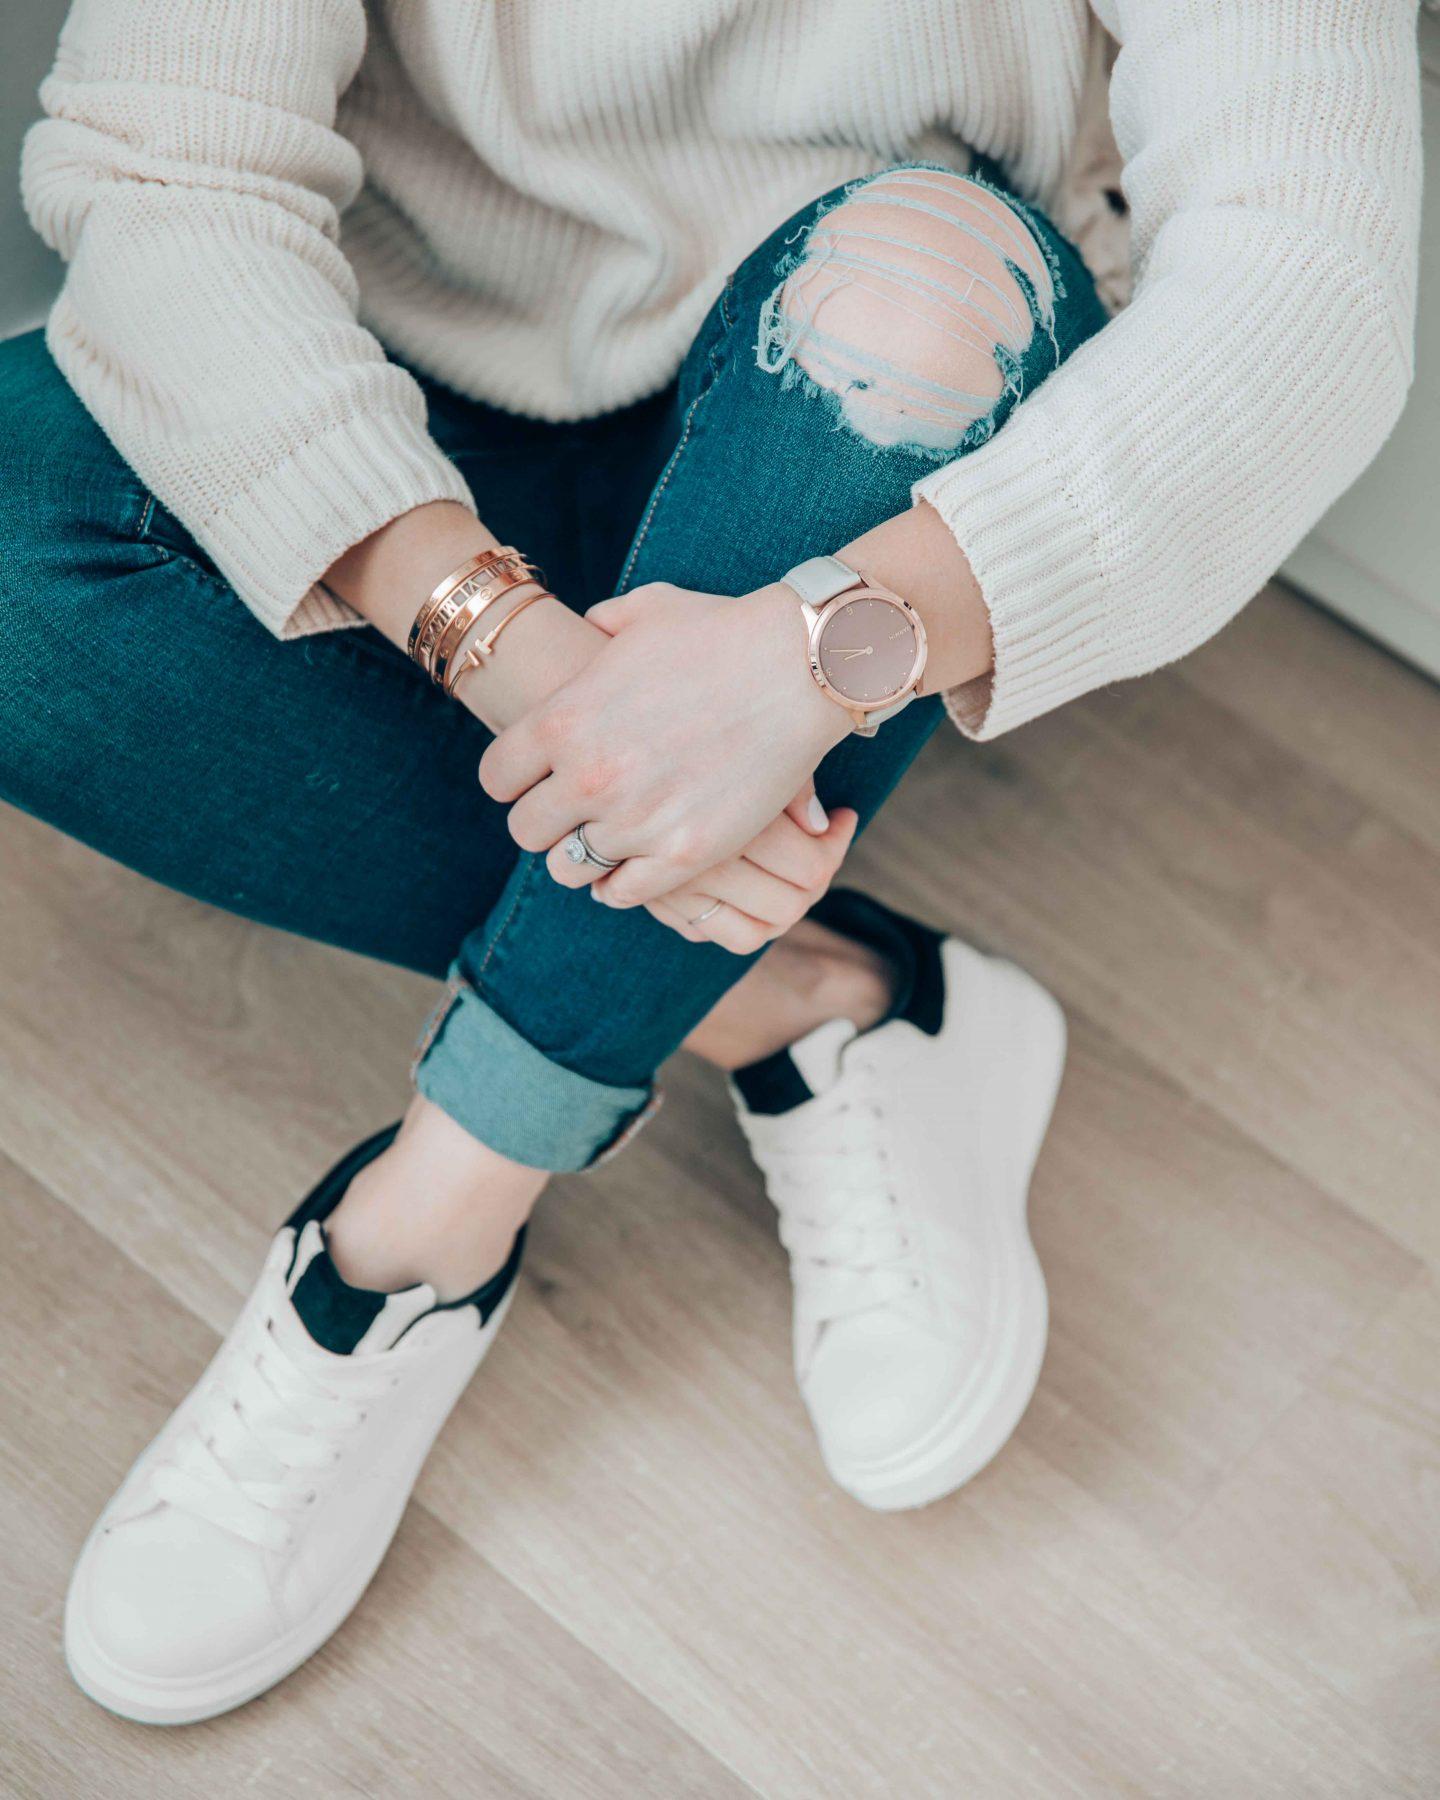 axelle blanpain white sneakers garmin vivomove luxe watch